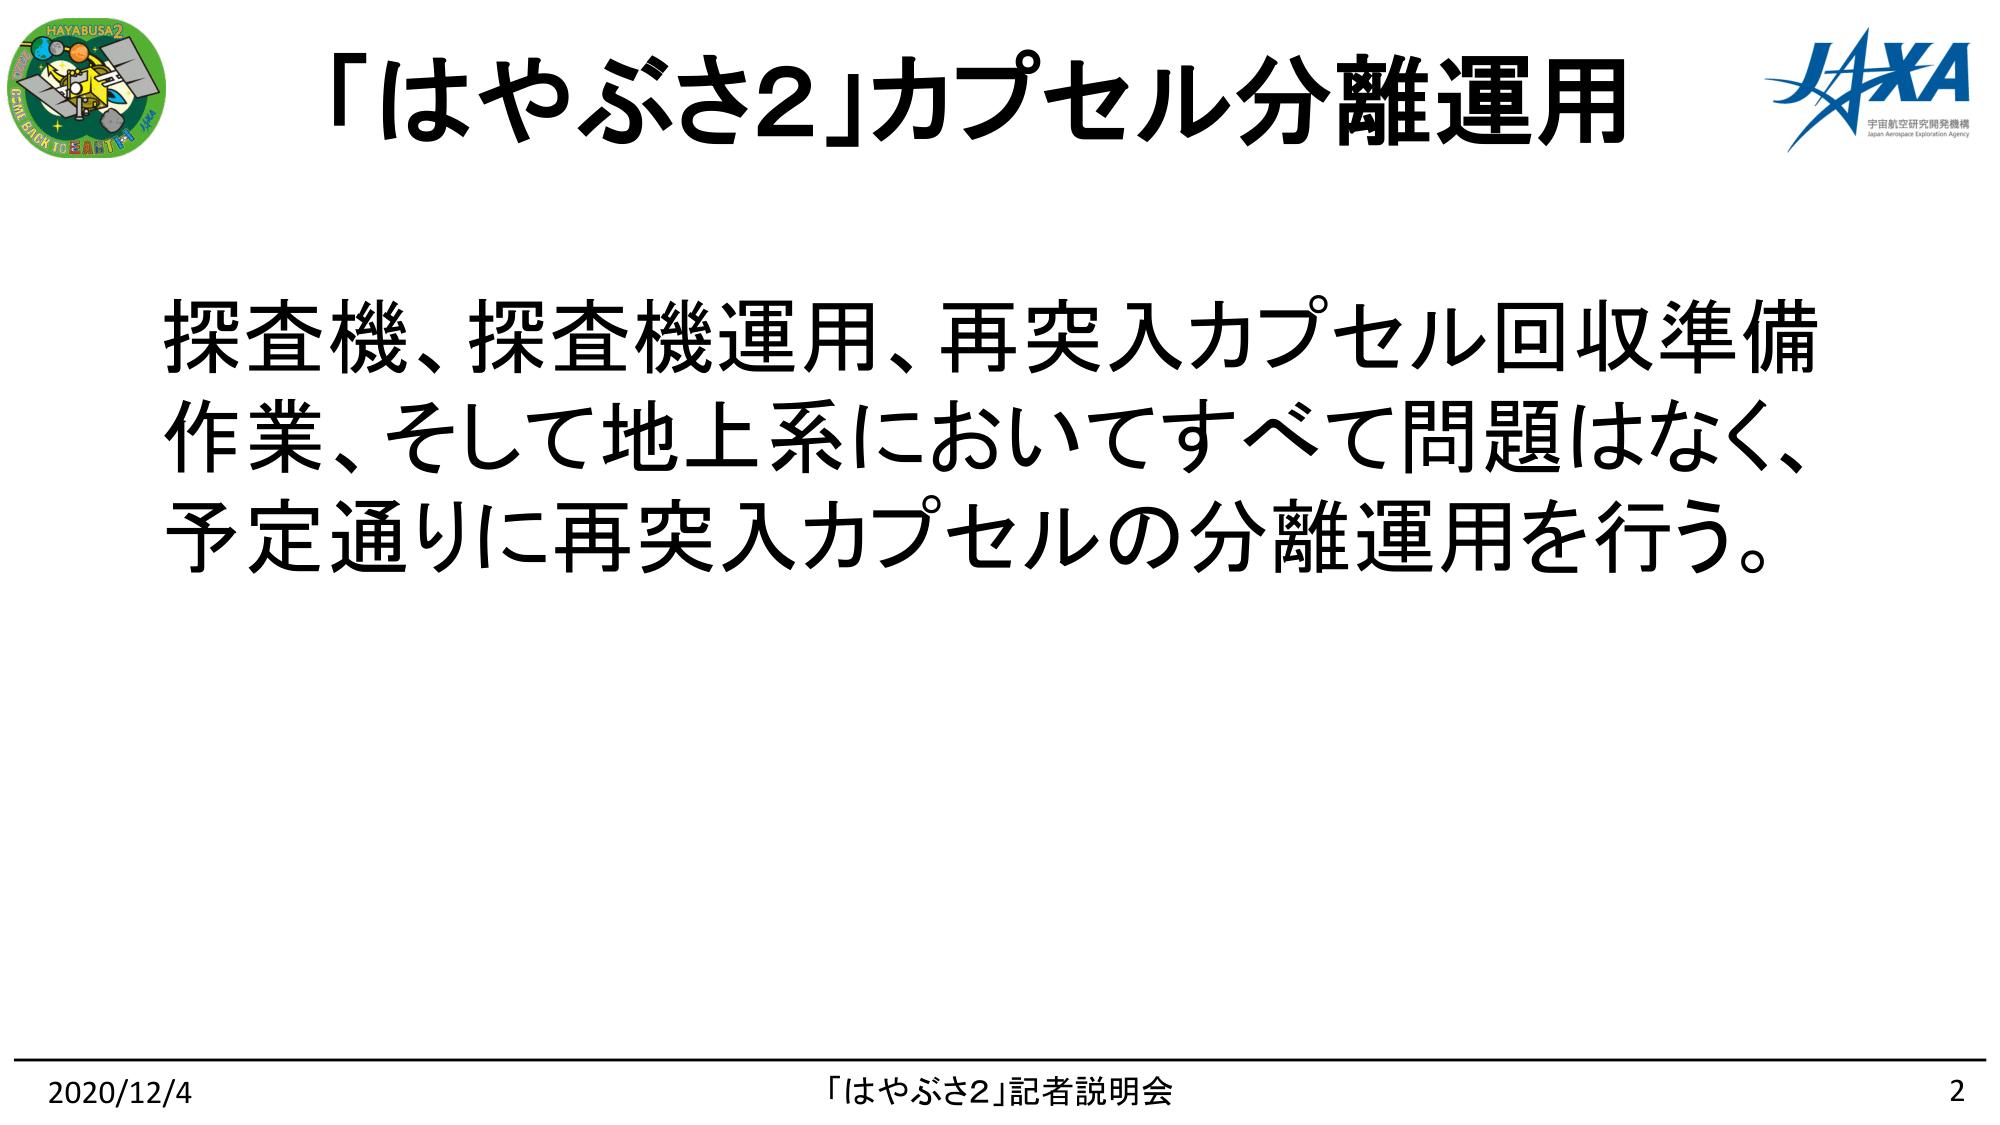 f:id:Imamura:20201204153707p:plain